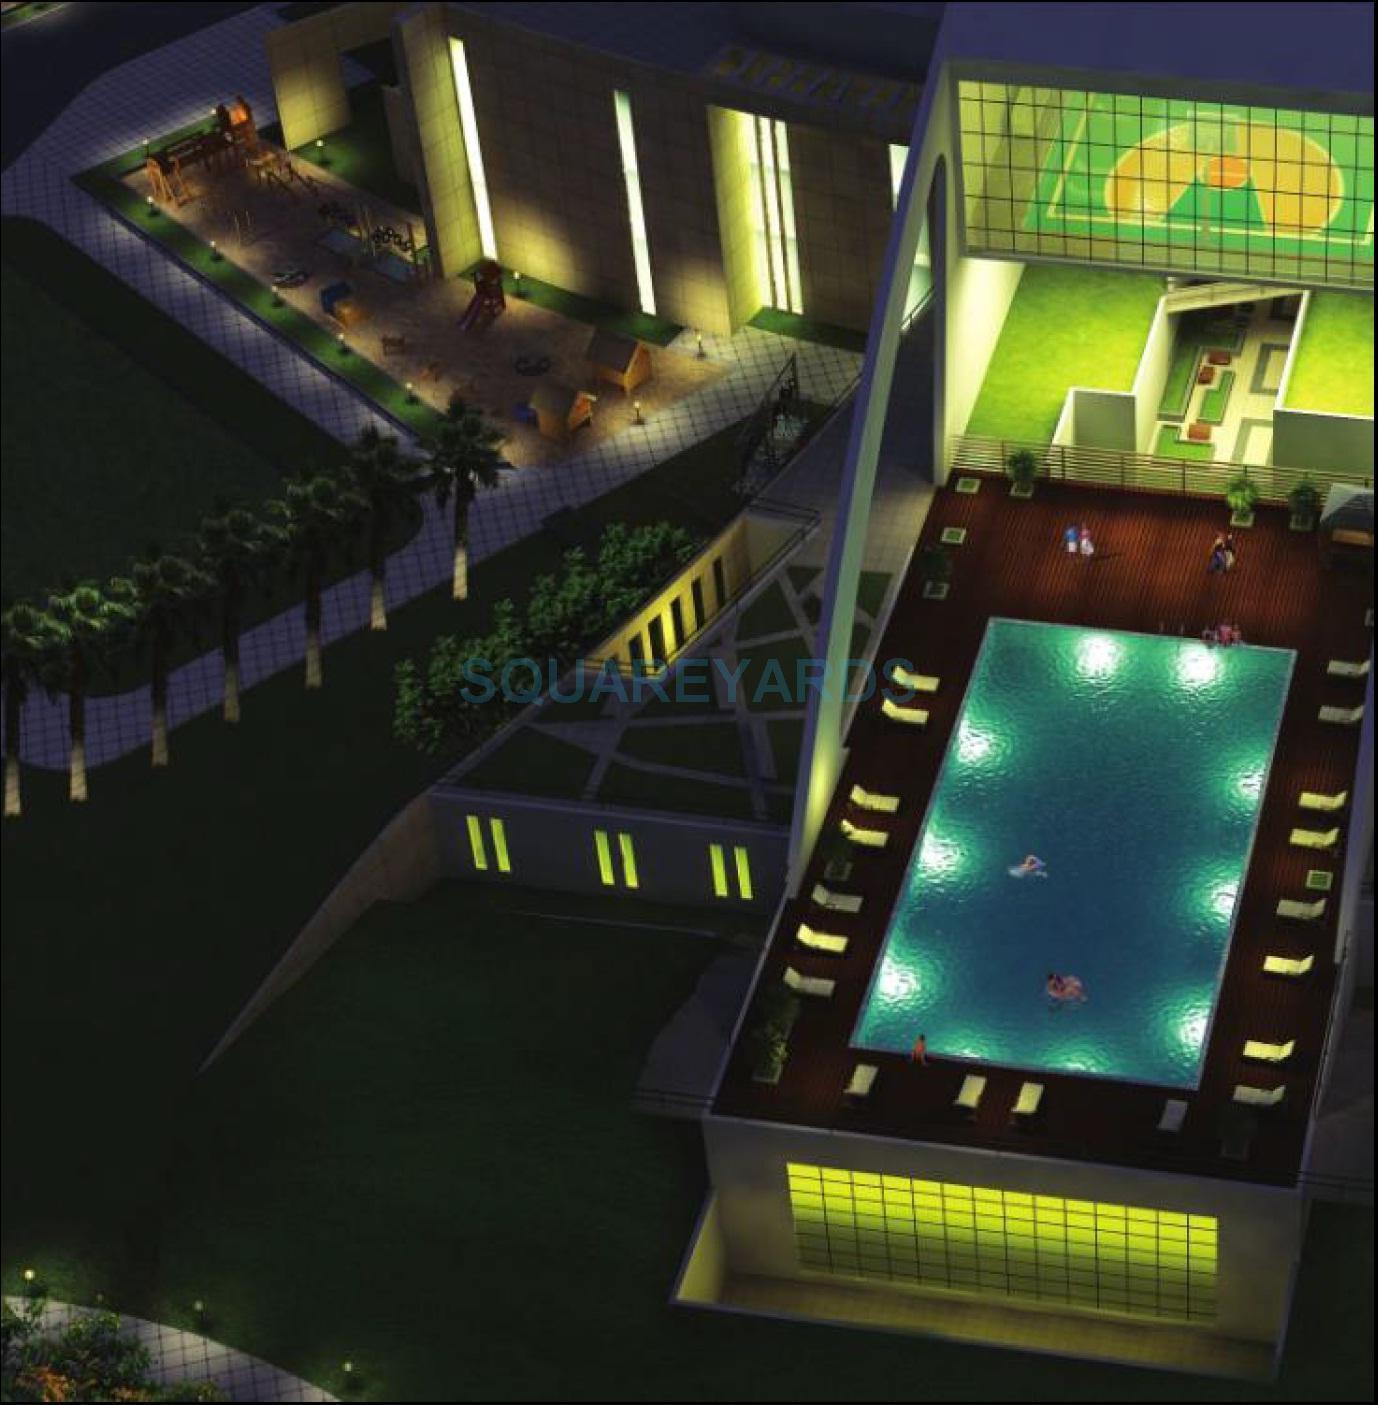 3c lotus boulevard clubhouse internal image3